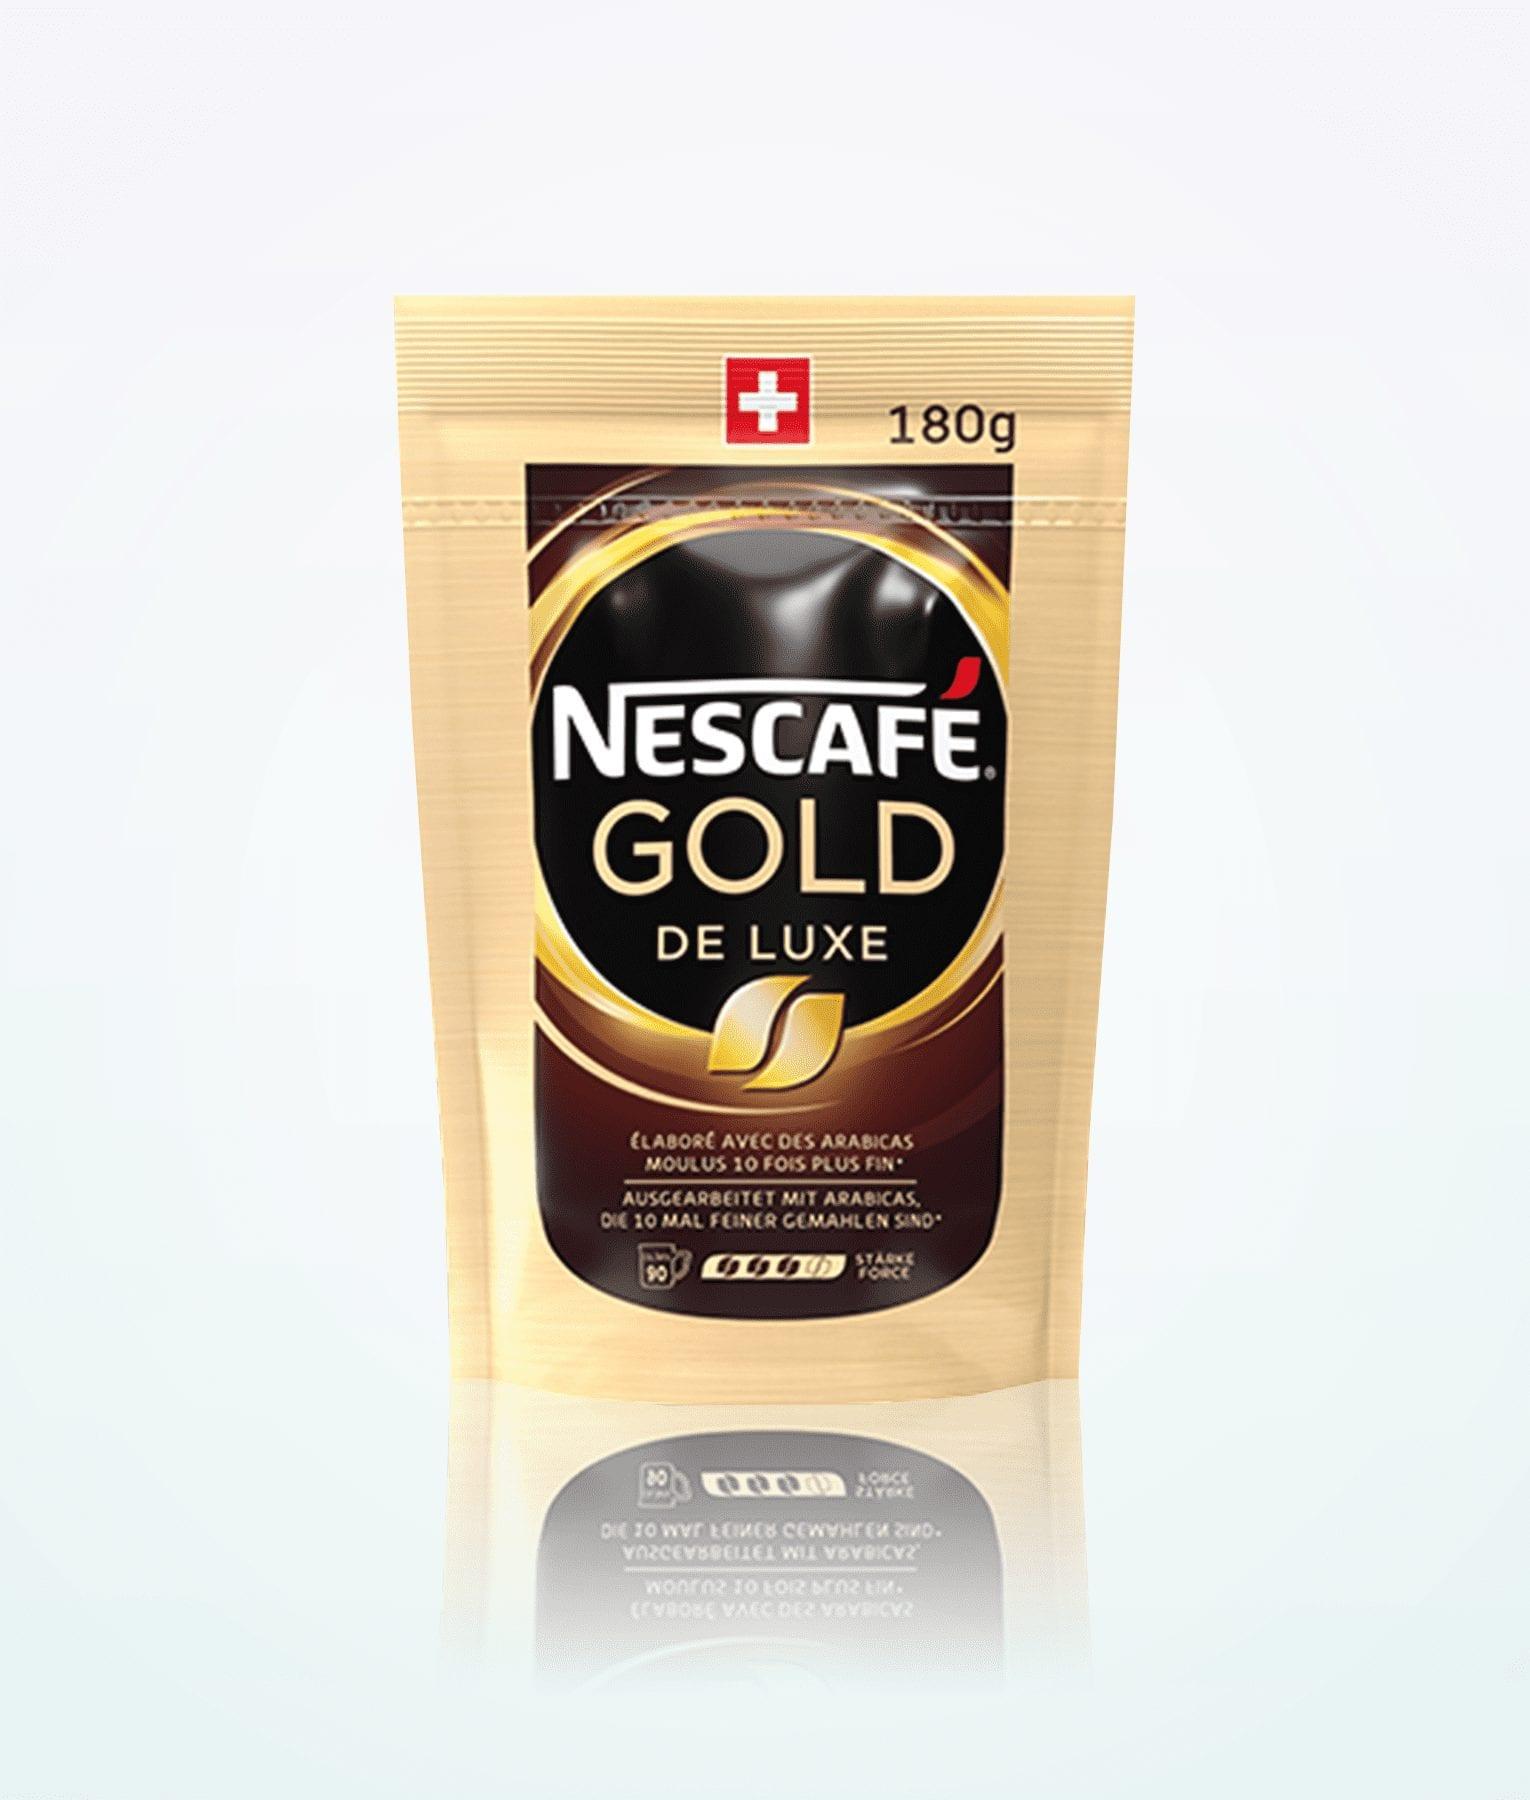 nescafe-gold-de-luxe-180g